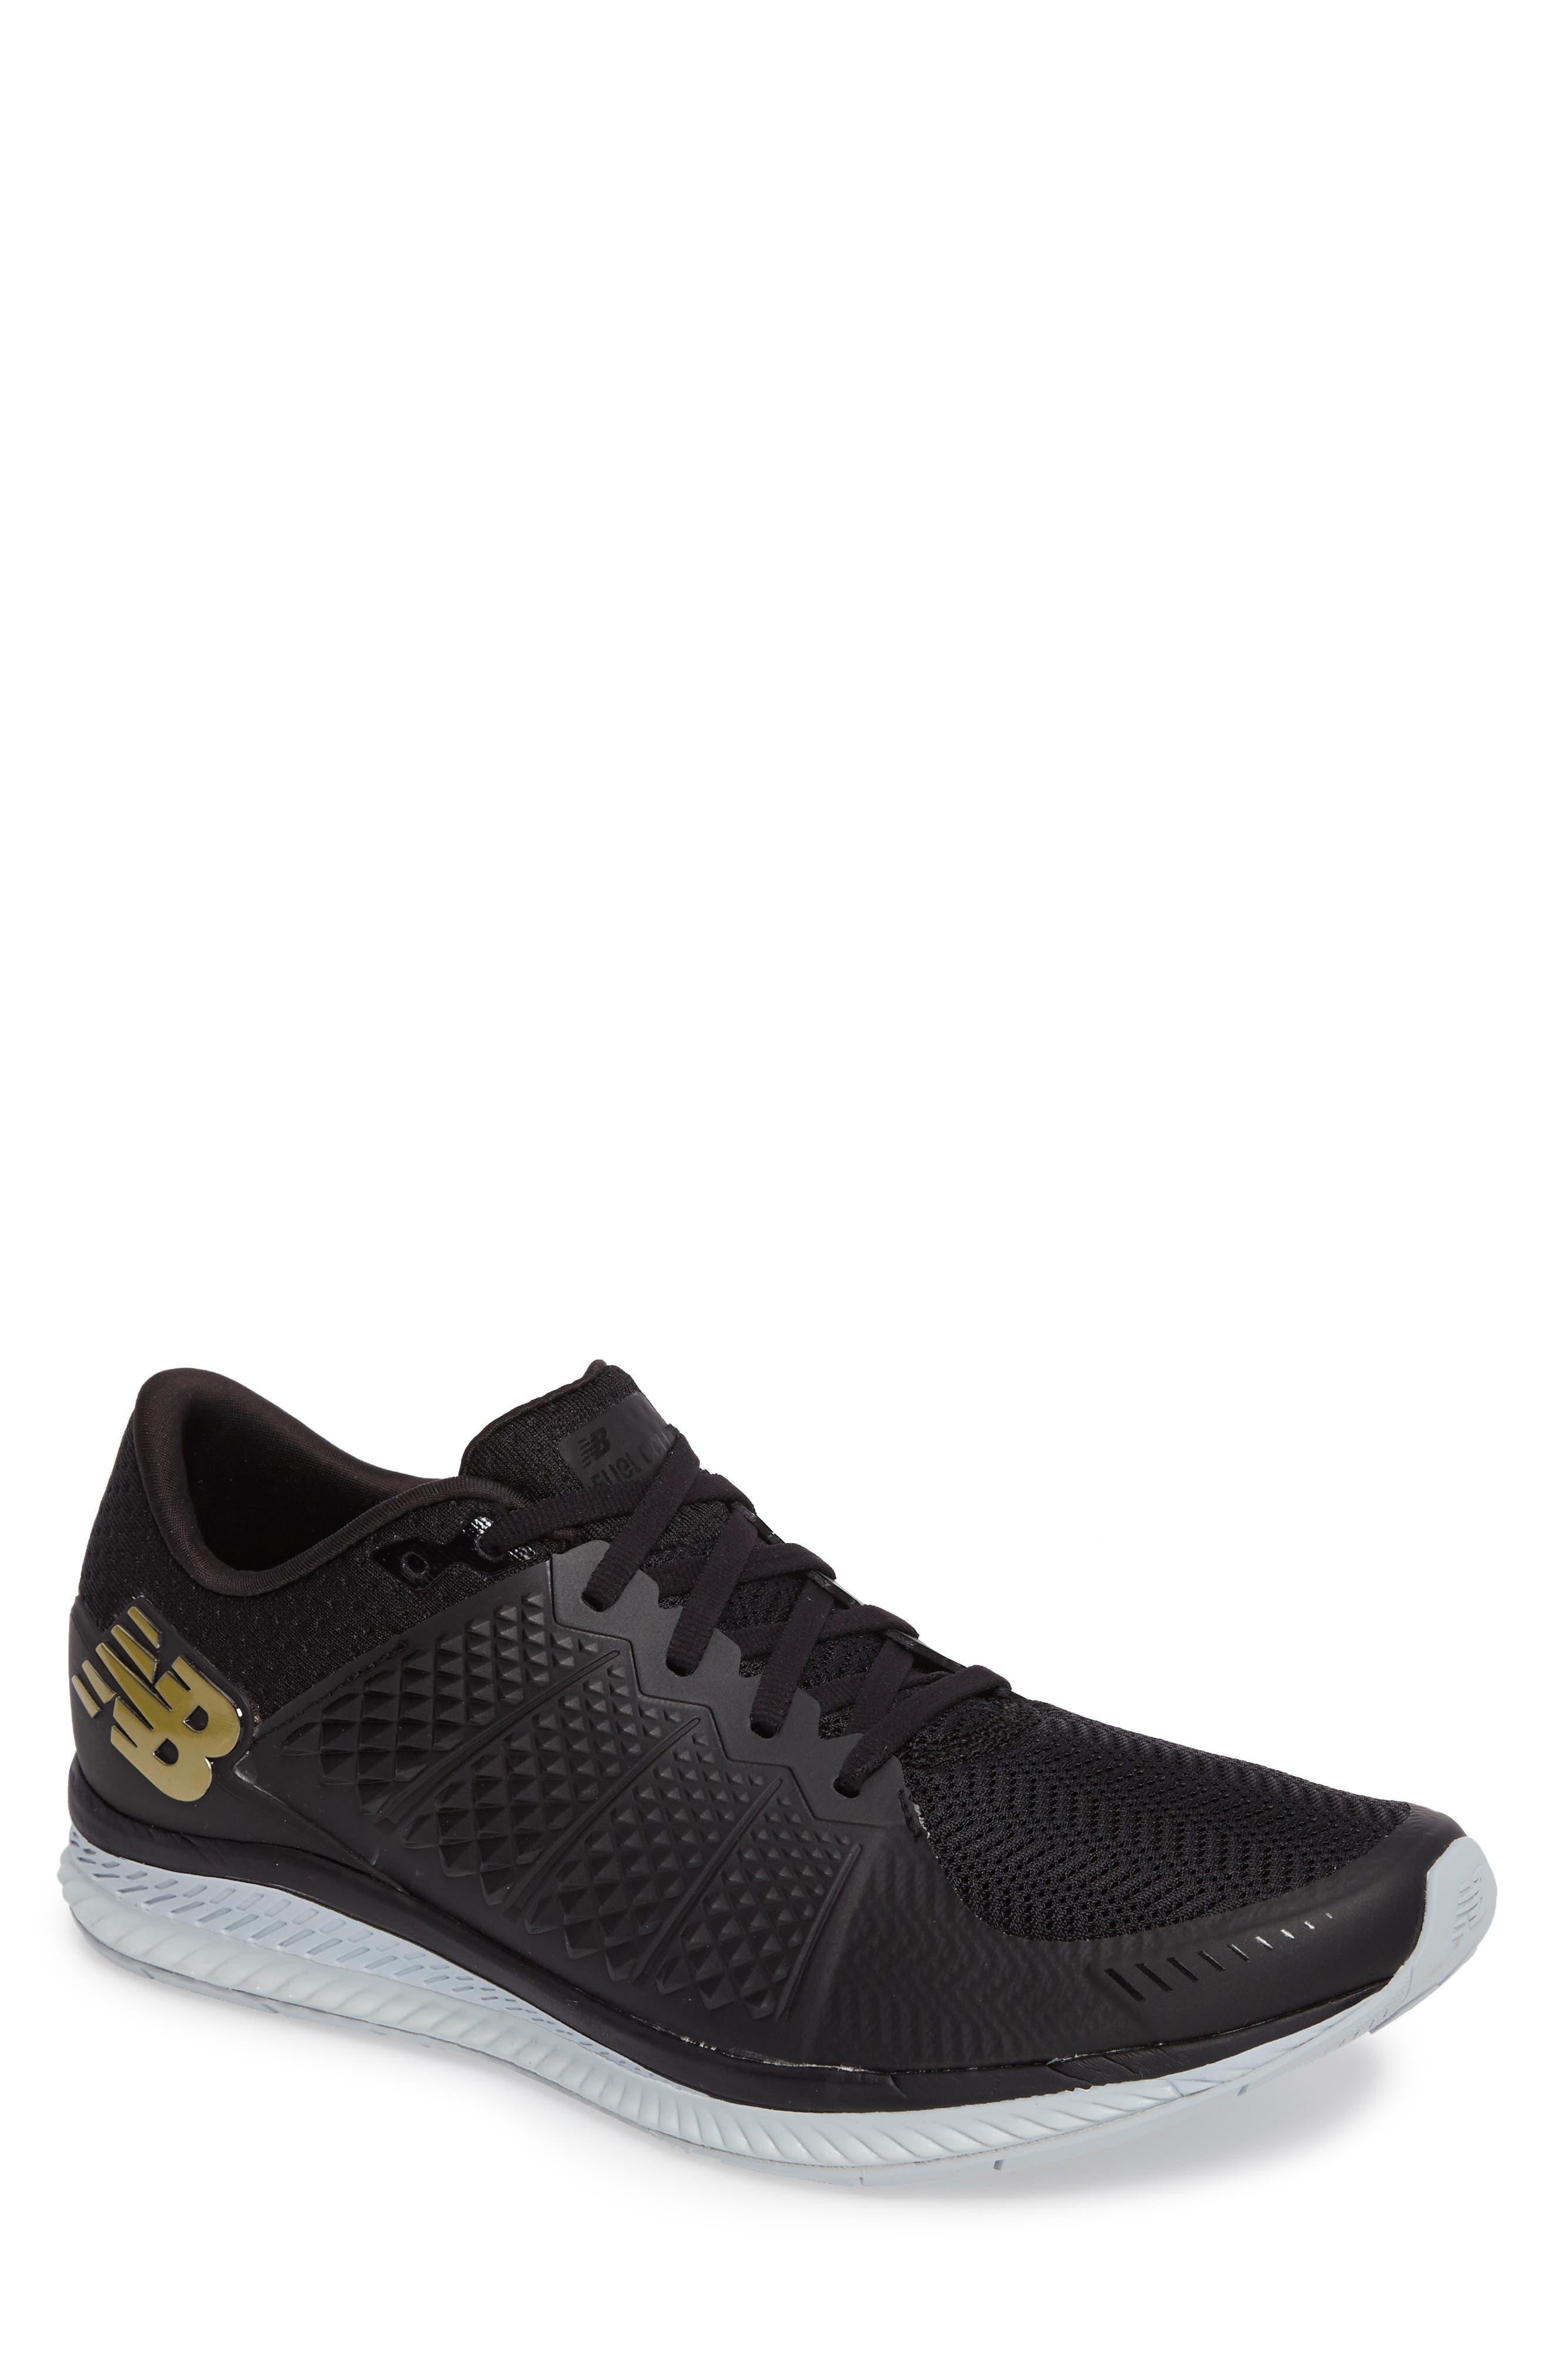 Main Image - New Balance Vazee Fuel Cell Running Shoe (Men)